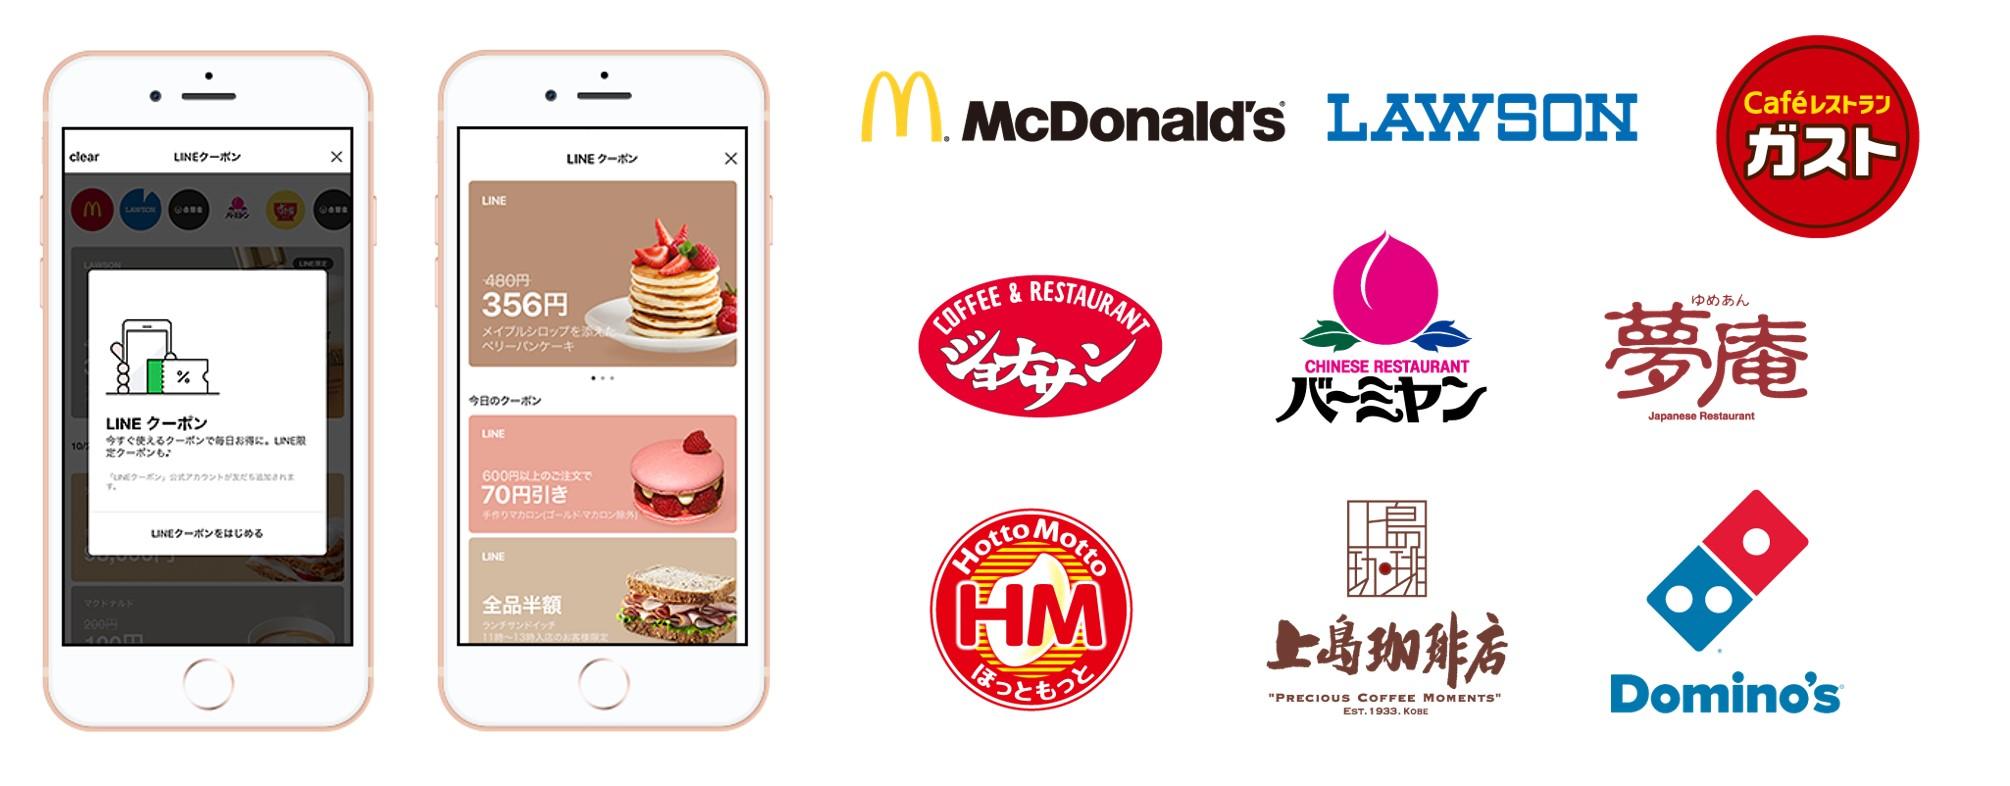 「LINEクーポン」でクーポンを提供するブランド